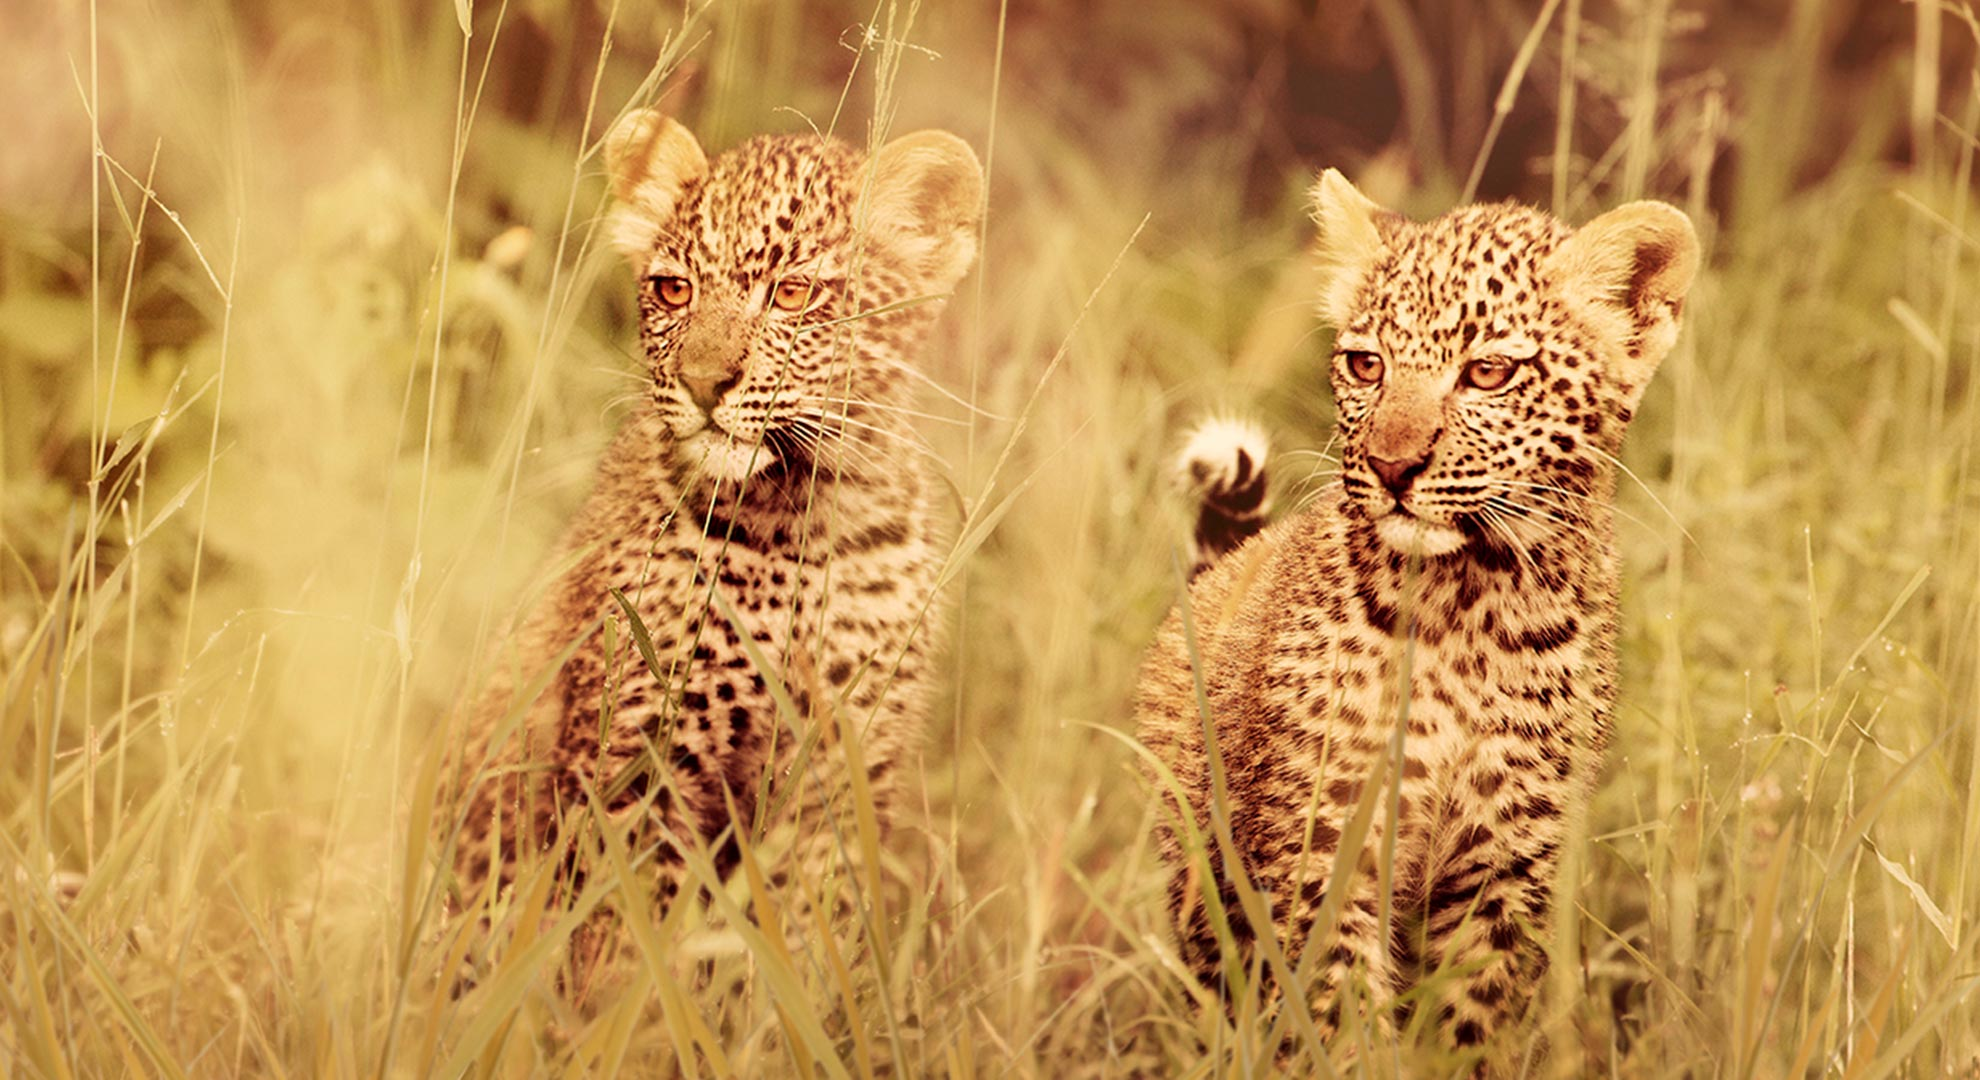 Mzuri and Dada the Leopard cubs Serengeti 2